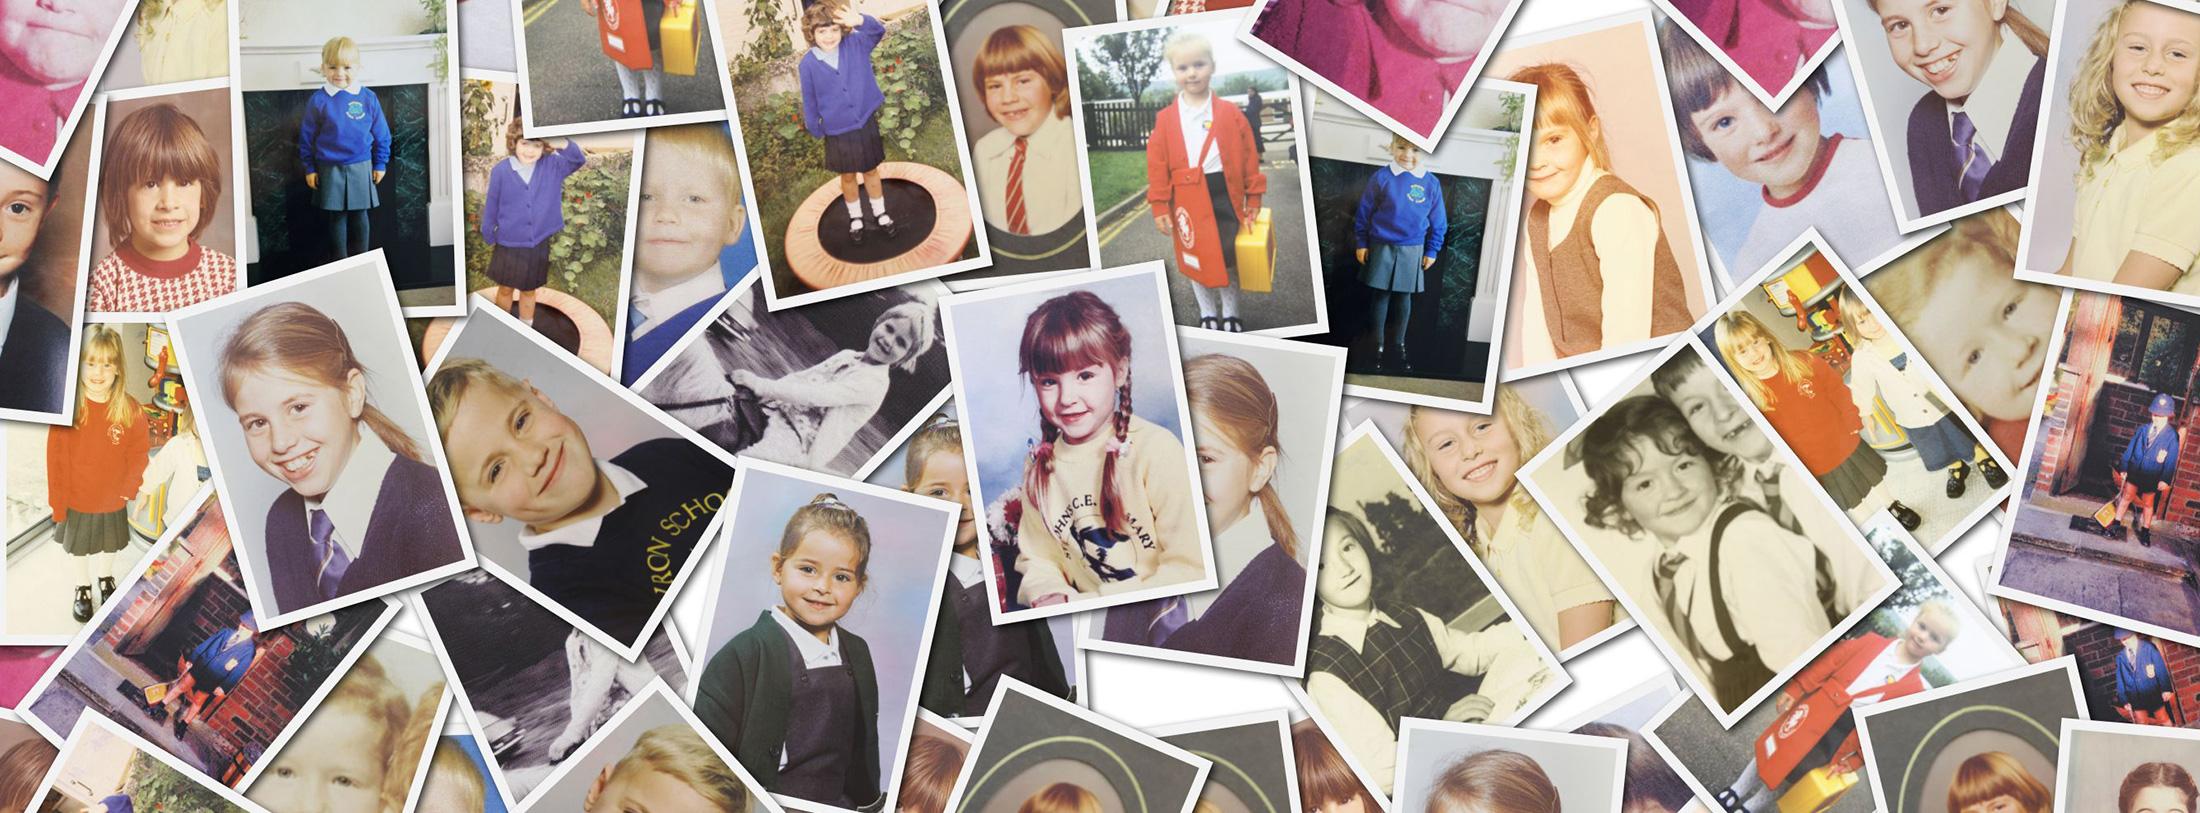 Helen's Happy School Memories of Lumpy Custard, Break-Time Milk and Woolly Tights…